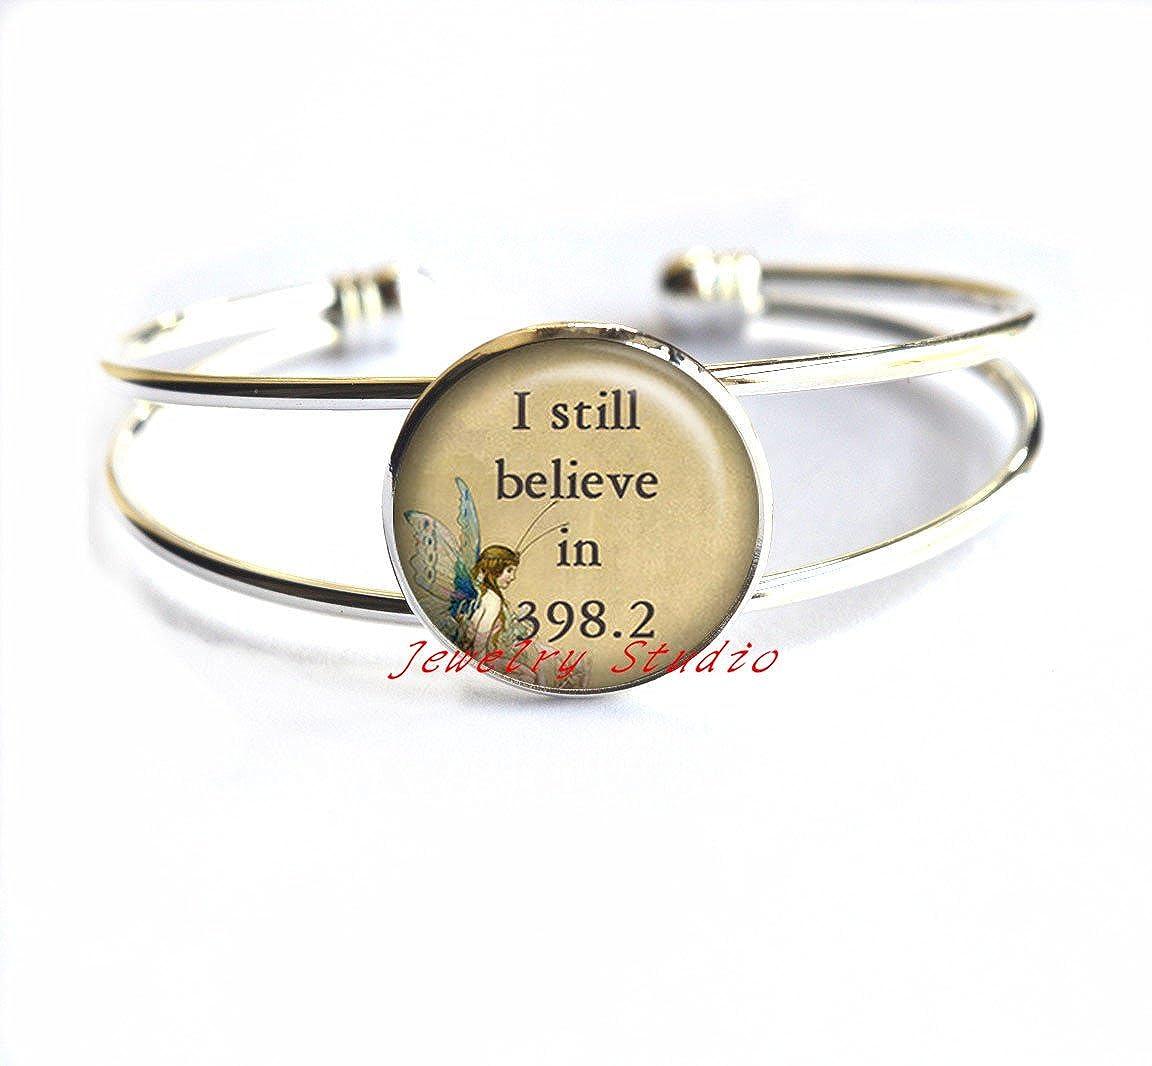 fairy tale Bracelet charm fairy jewelry book lover jewelry jewelry 398.2 Bracelets-HZ00357 I still believe in 398.2 with Fairy Bracelet